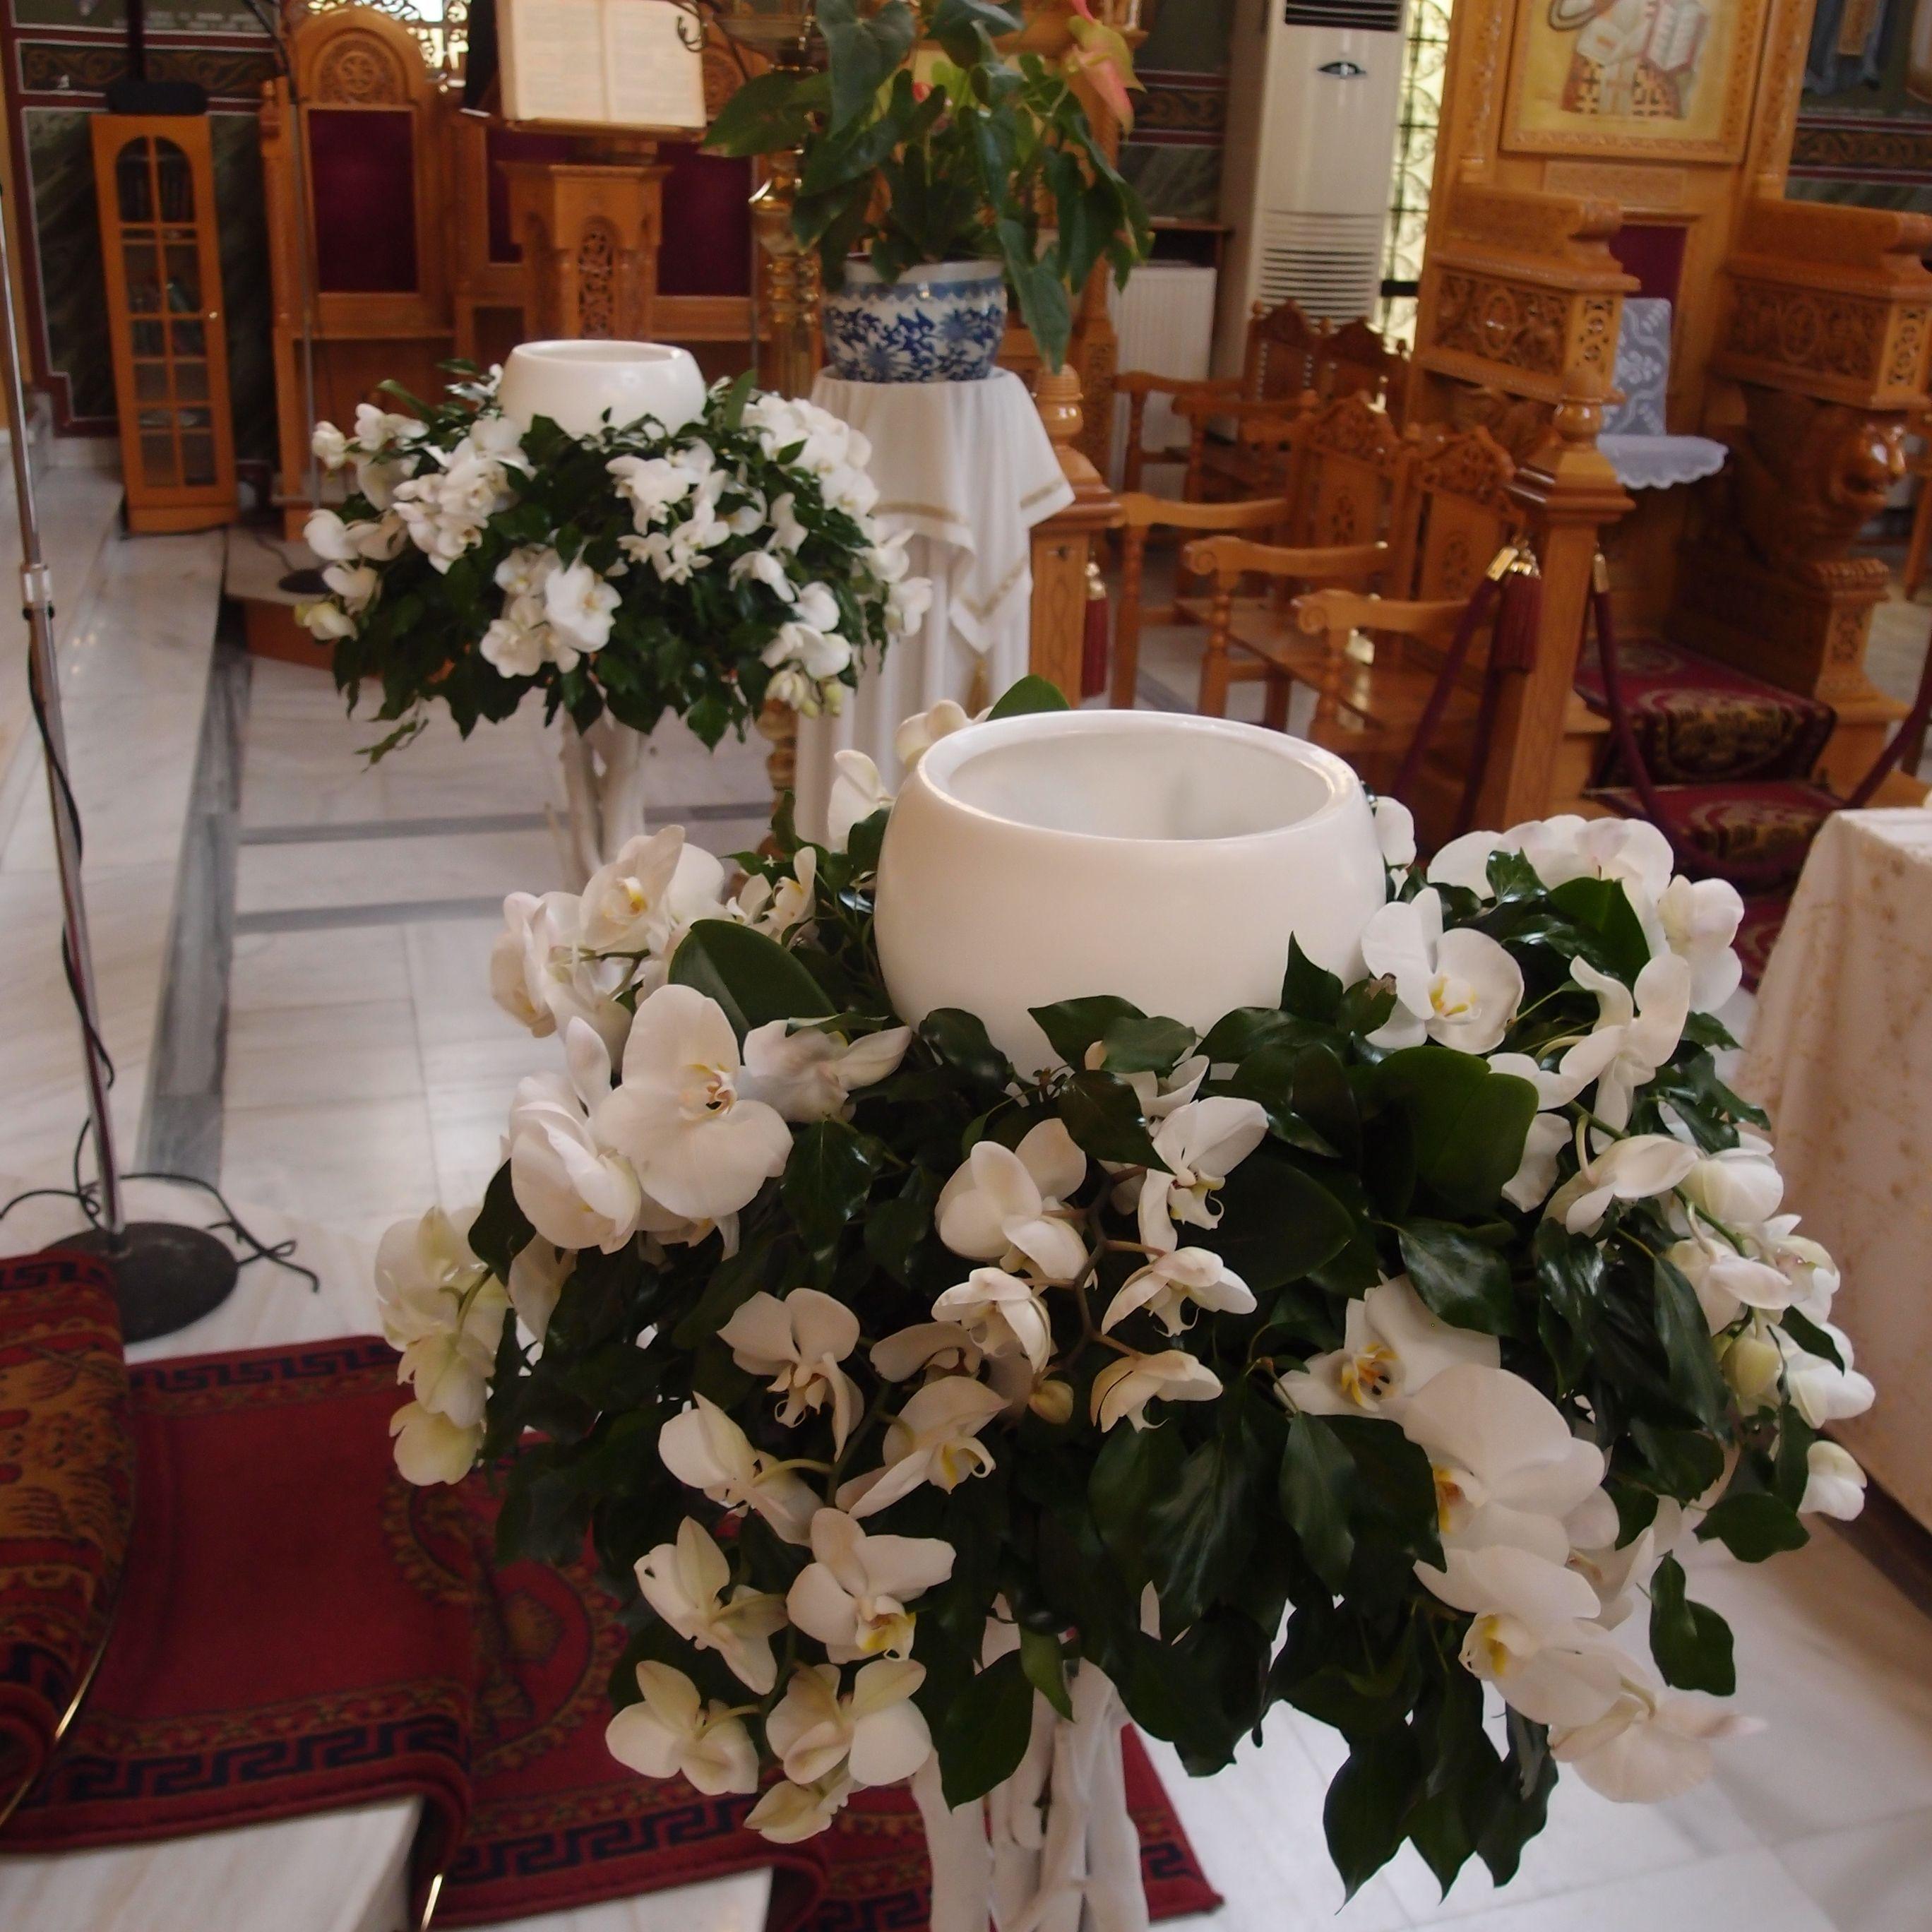 00fcb1483287 λαμπάδες γάμου με ορχιδέες αφελένοψης σε βάσεις από θαλασσόξυλα..Δεξίωση